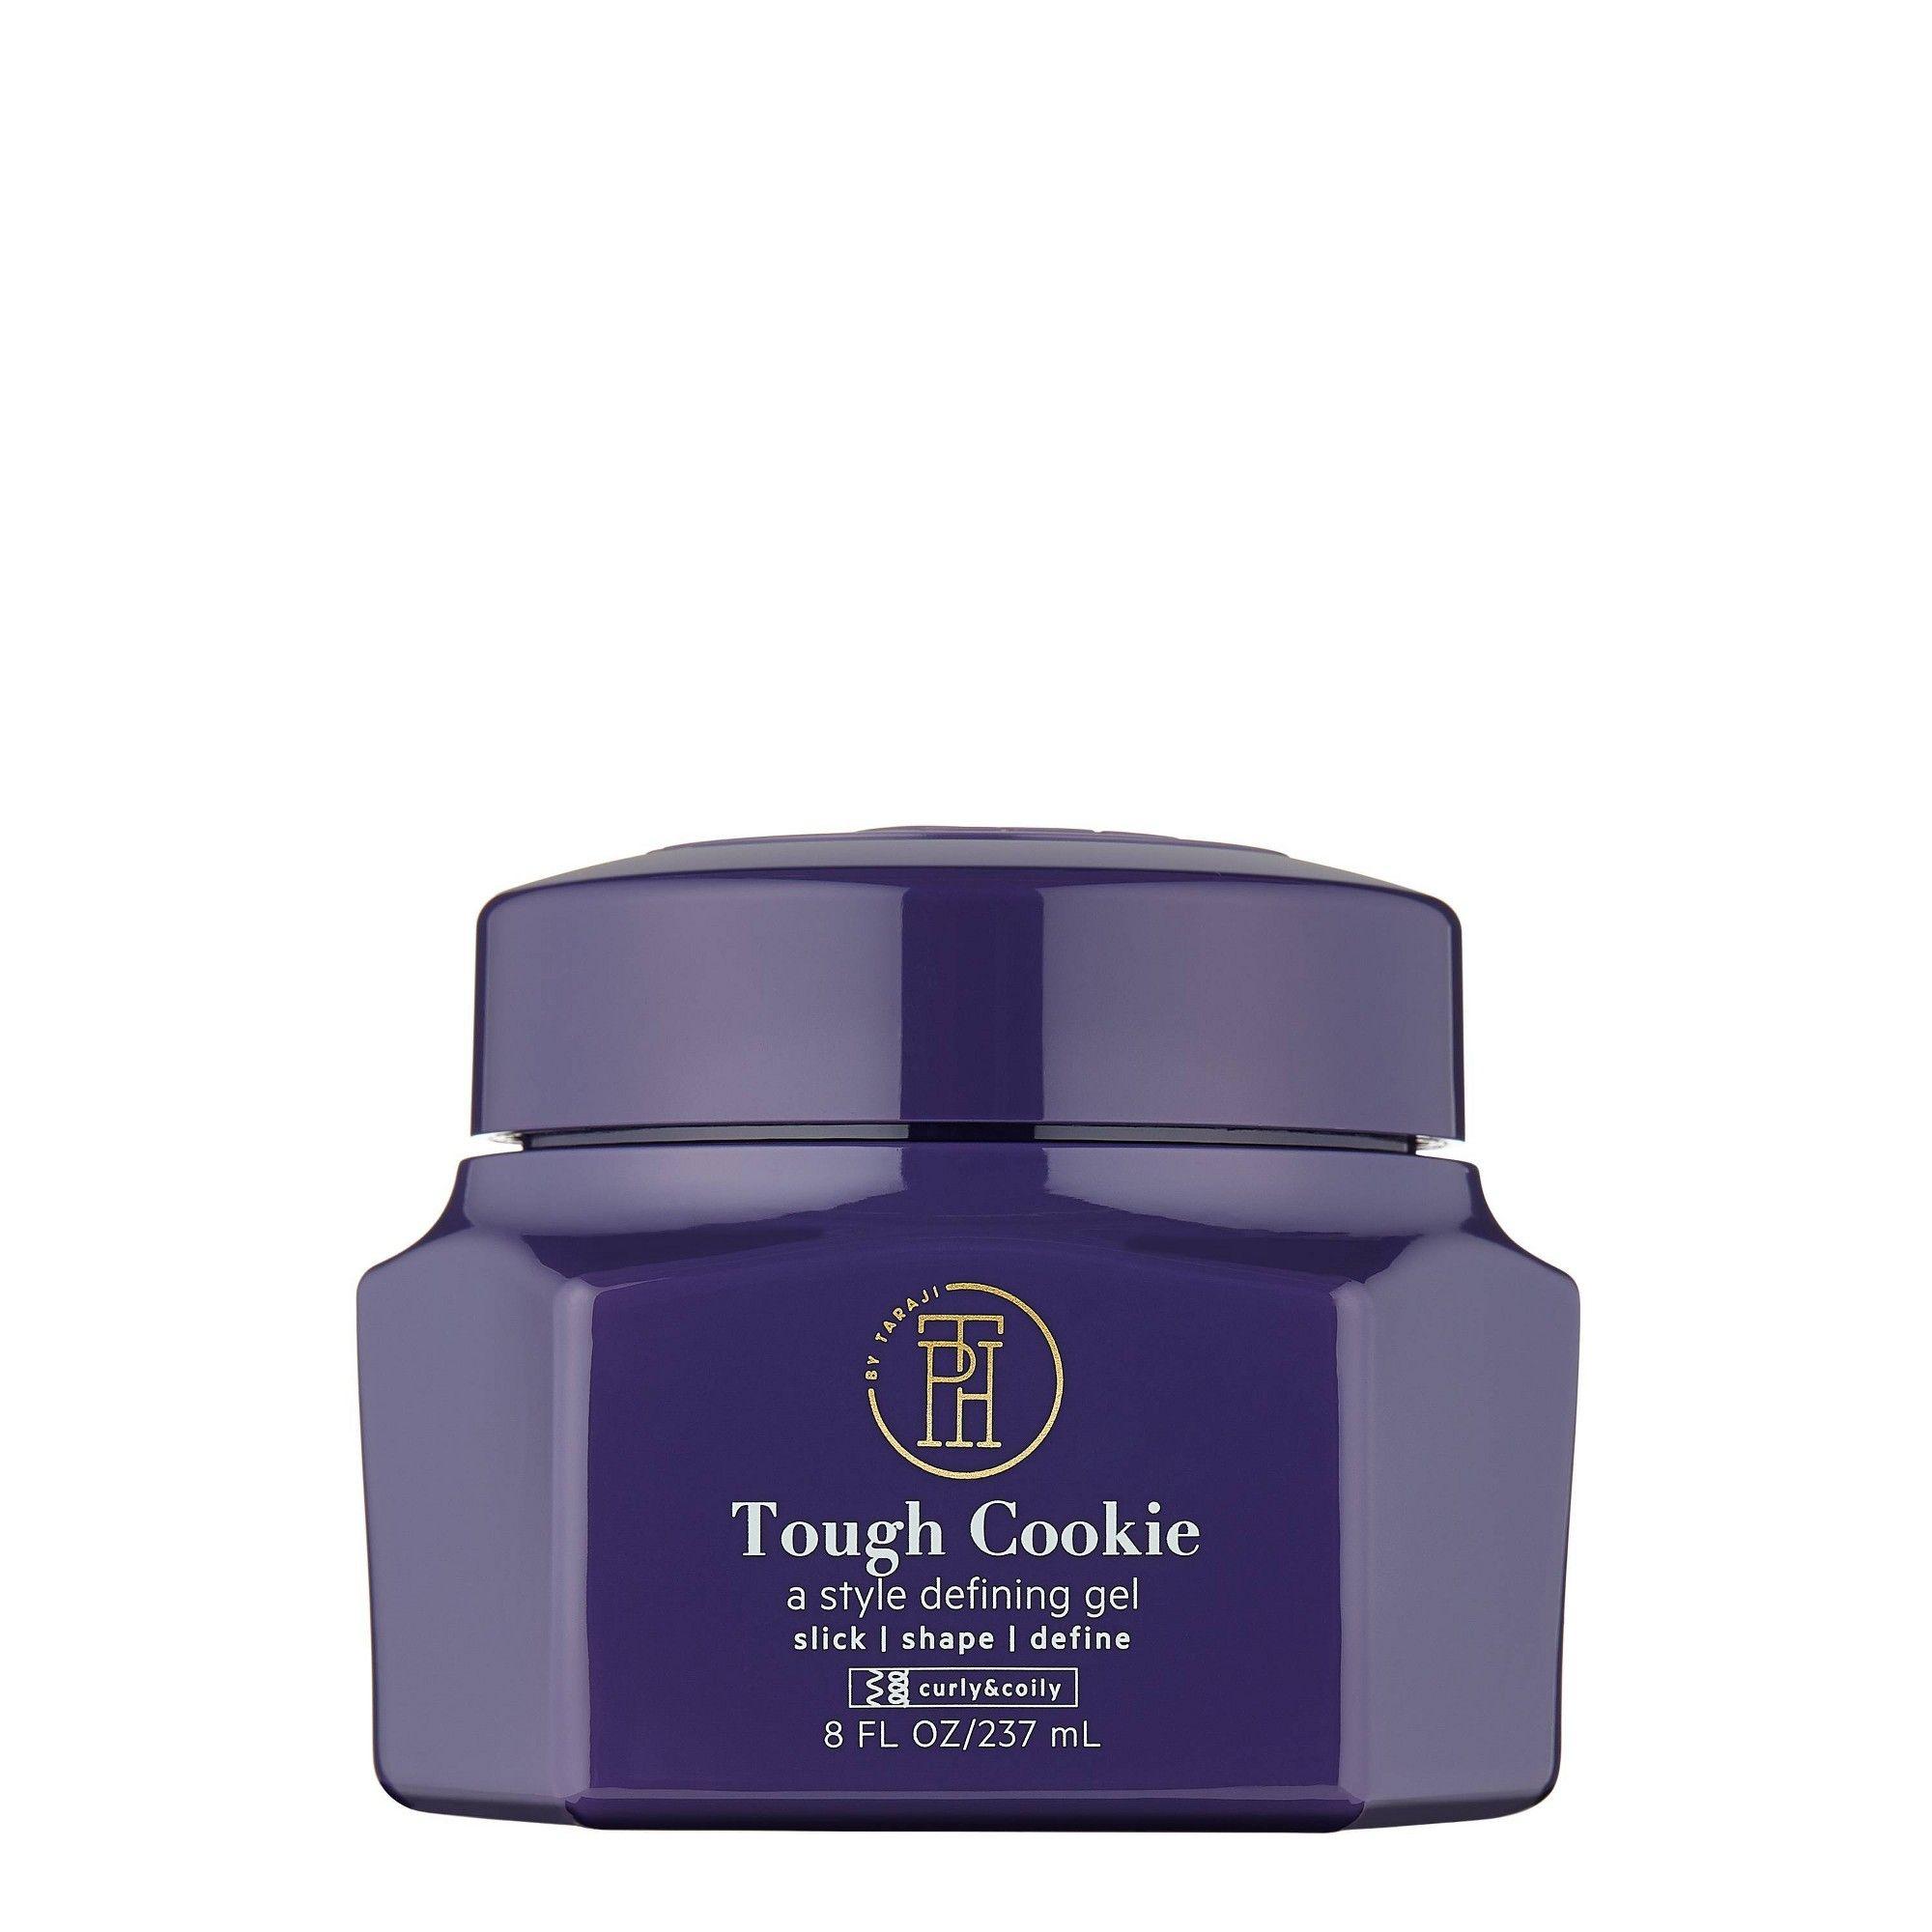 TPH by TARAJI Tough Cookie Style Defining Gel 8 fl oz in